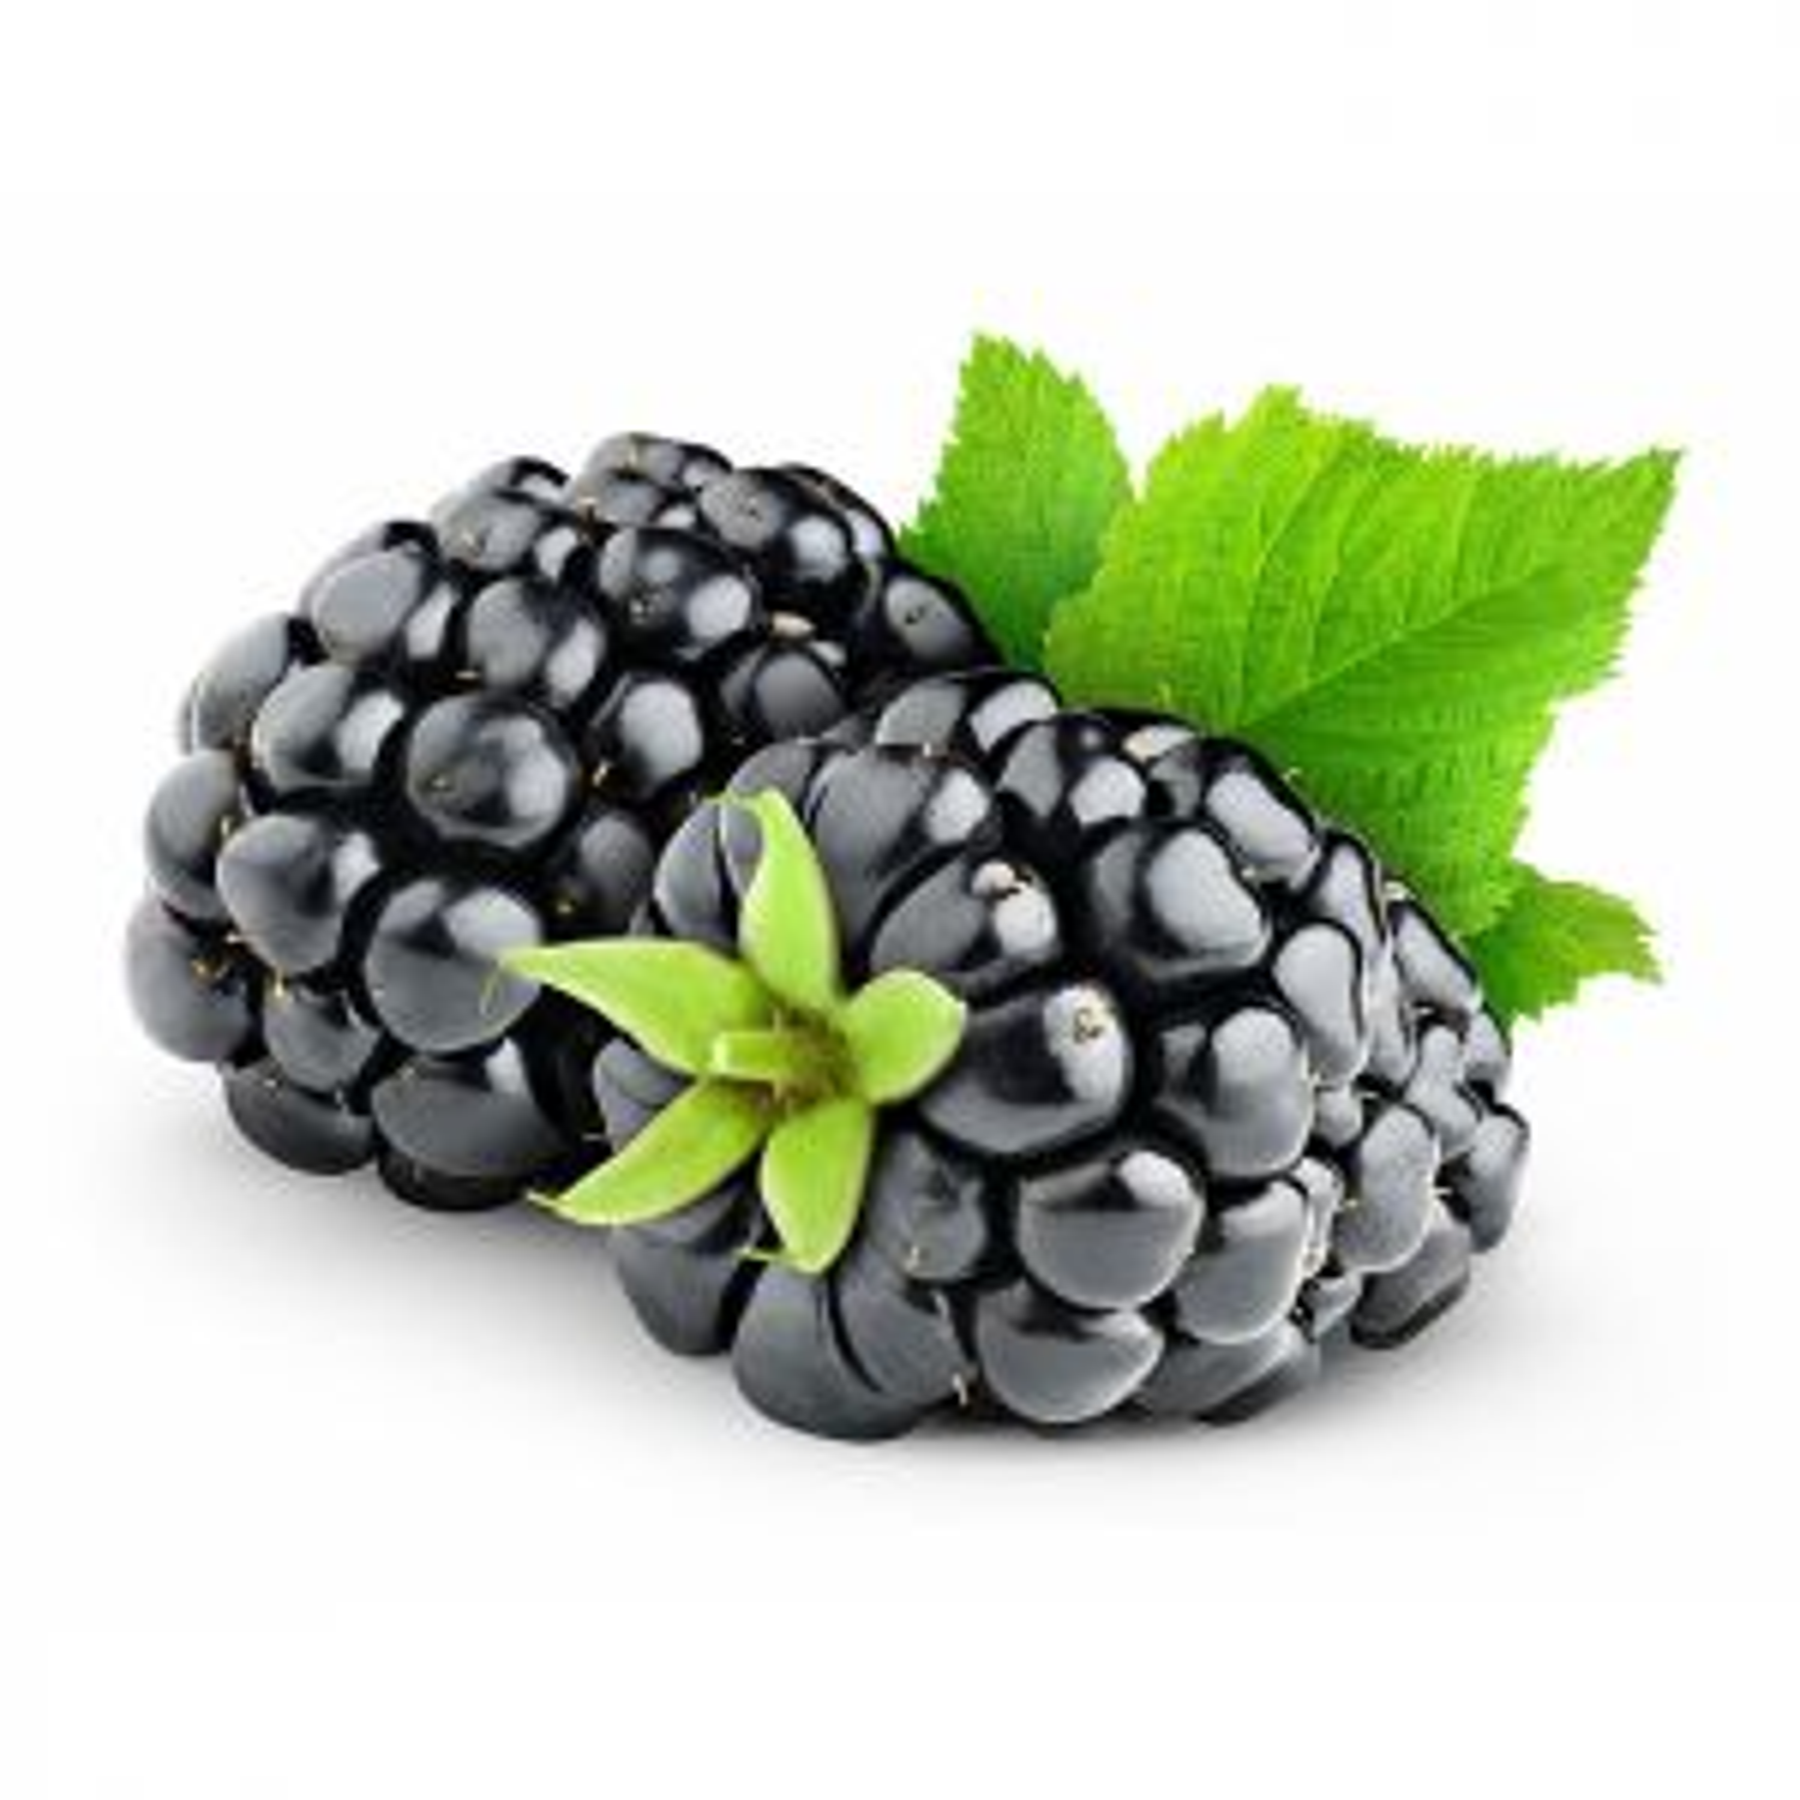 Skoddejuice Blackberry Aroma